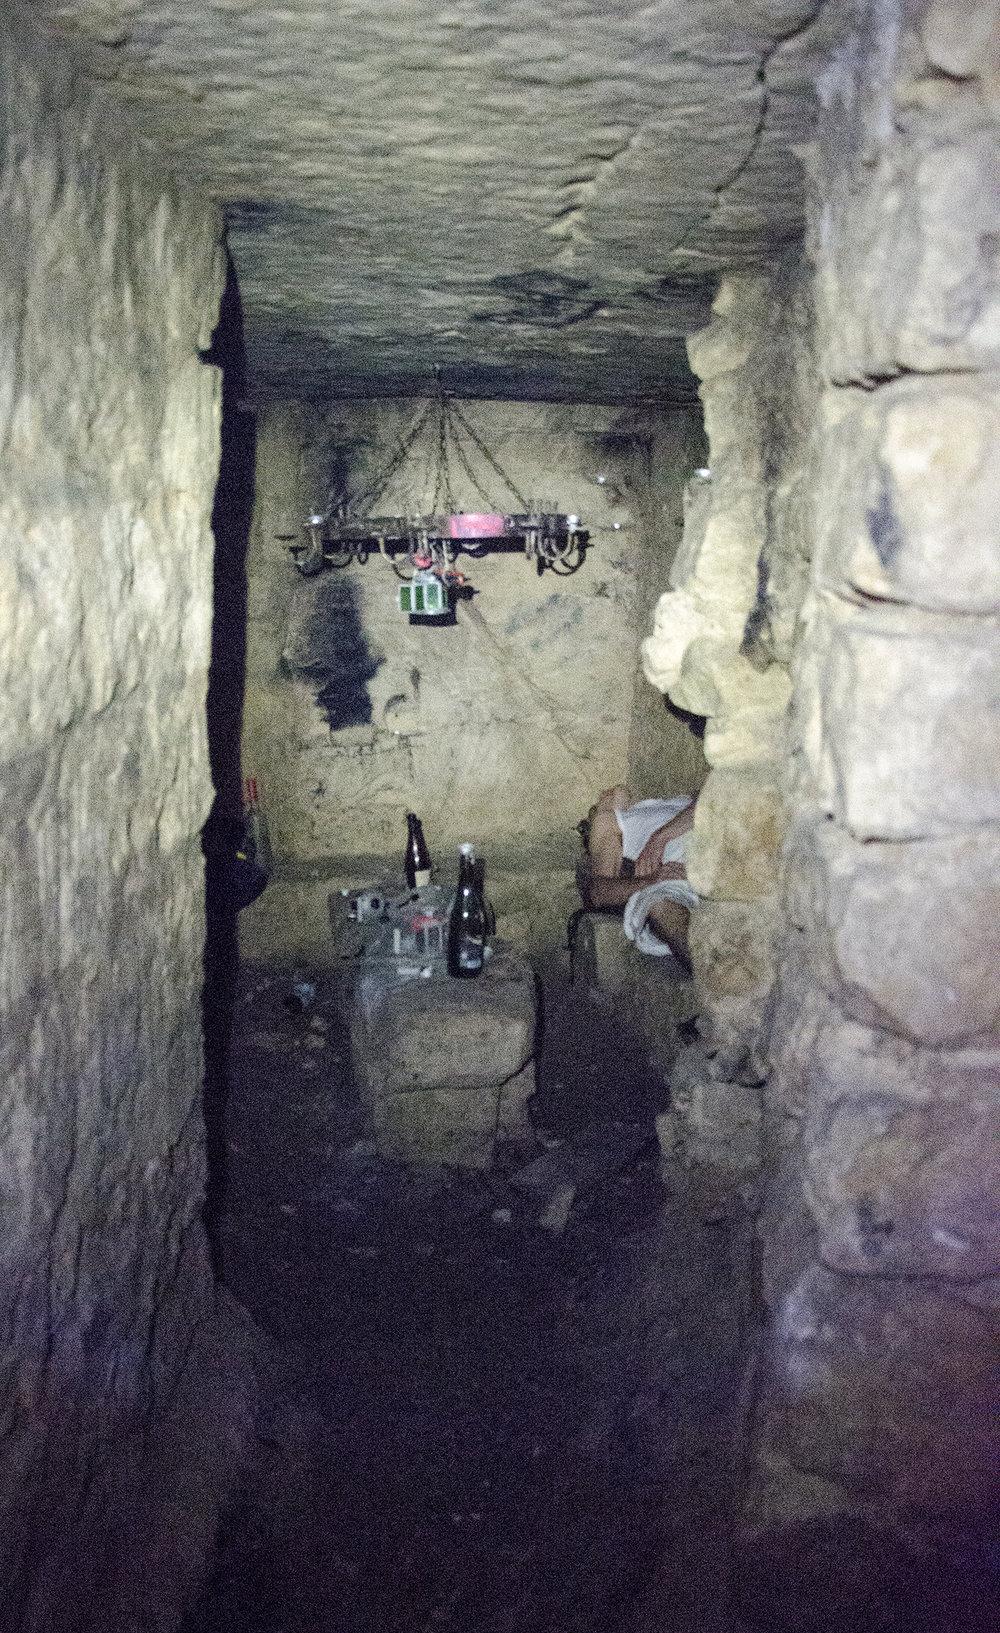 Catacomb2_Sleeper_8544.jpg